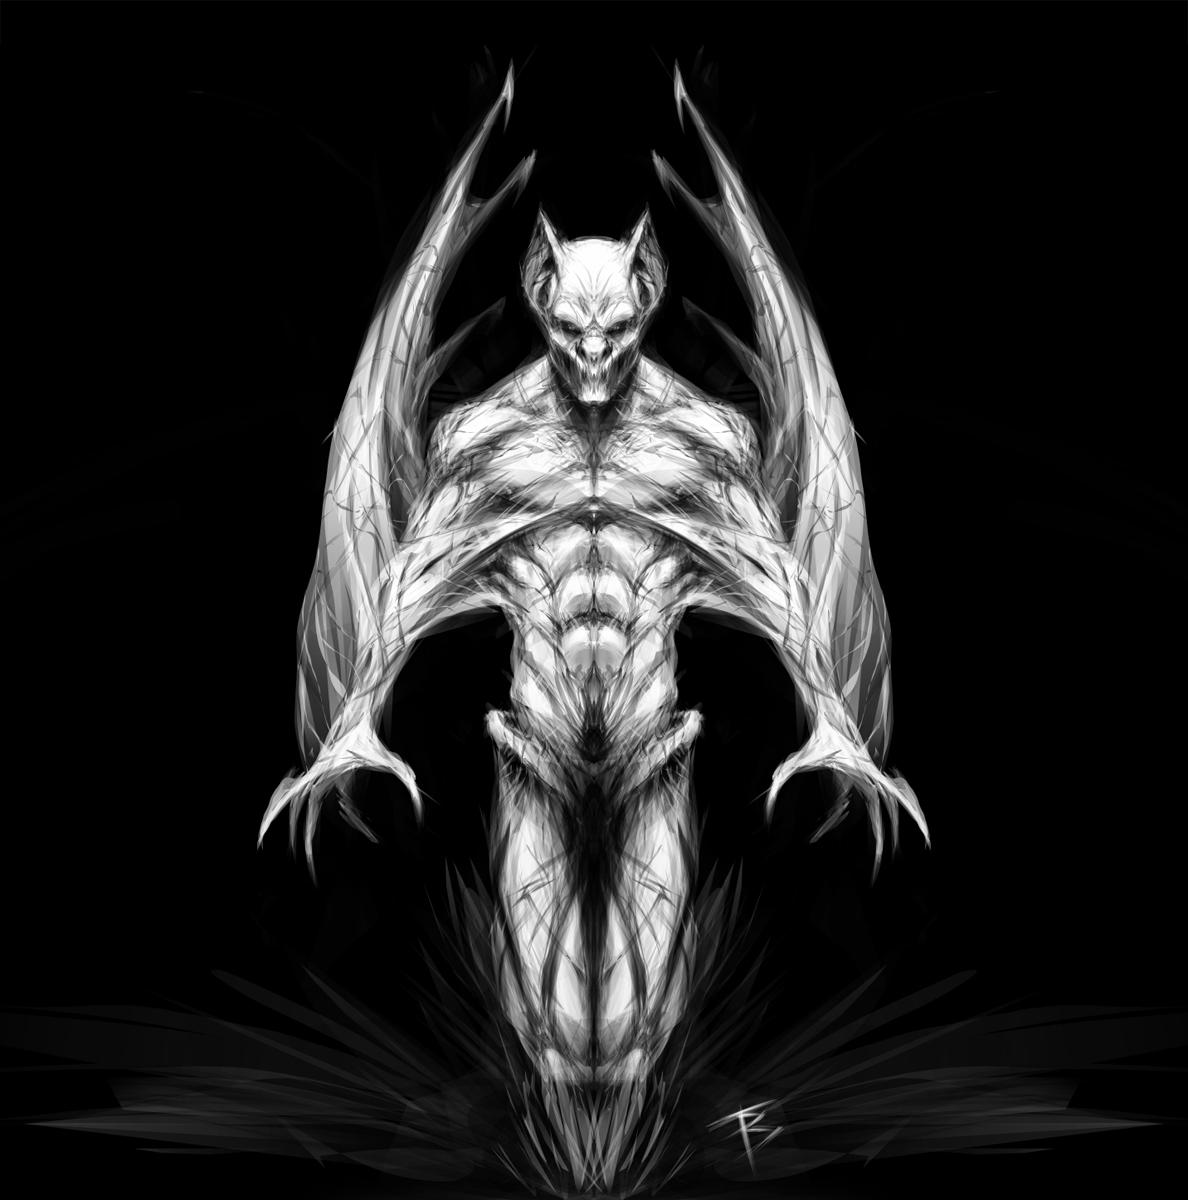 Vampire by TBoy85